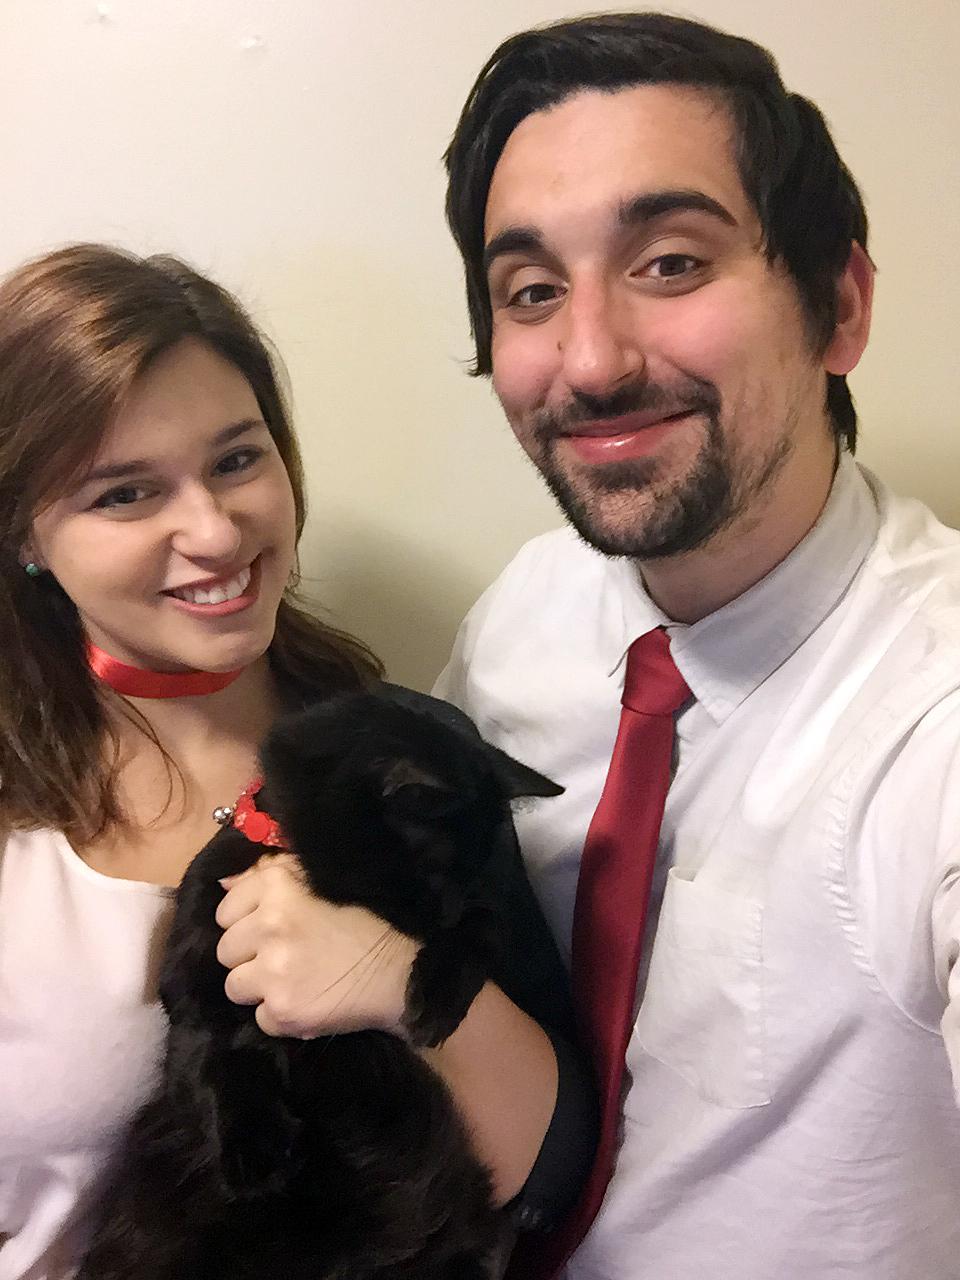 Natalie and Michael Bishop Bleeding Disorders Awareness